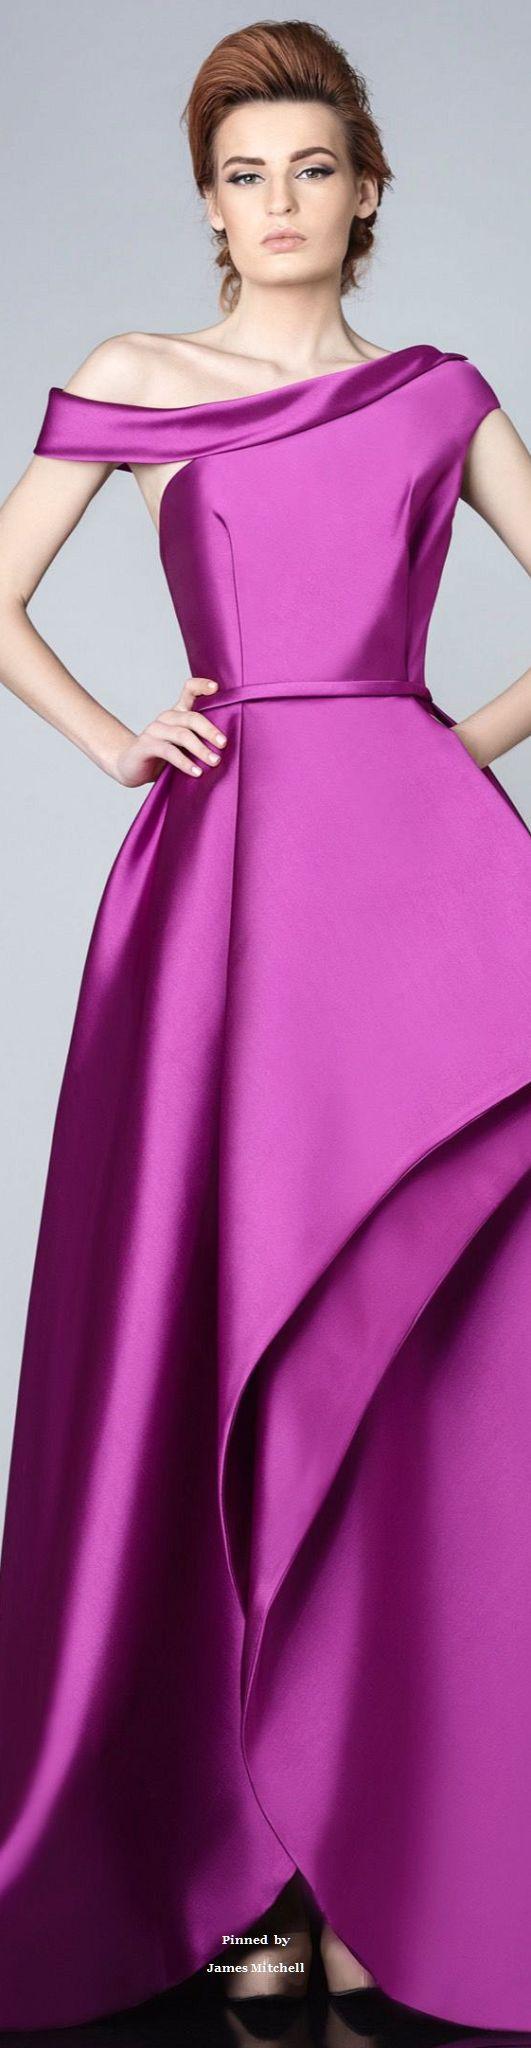 262 best Roupas images on Pinterest | Vestido elegante, Blusas y Costura